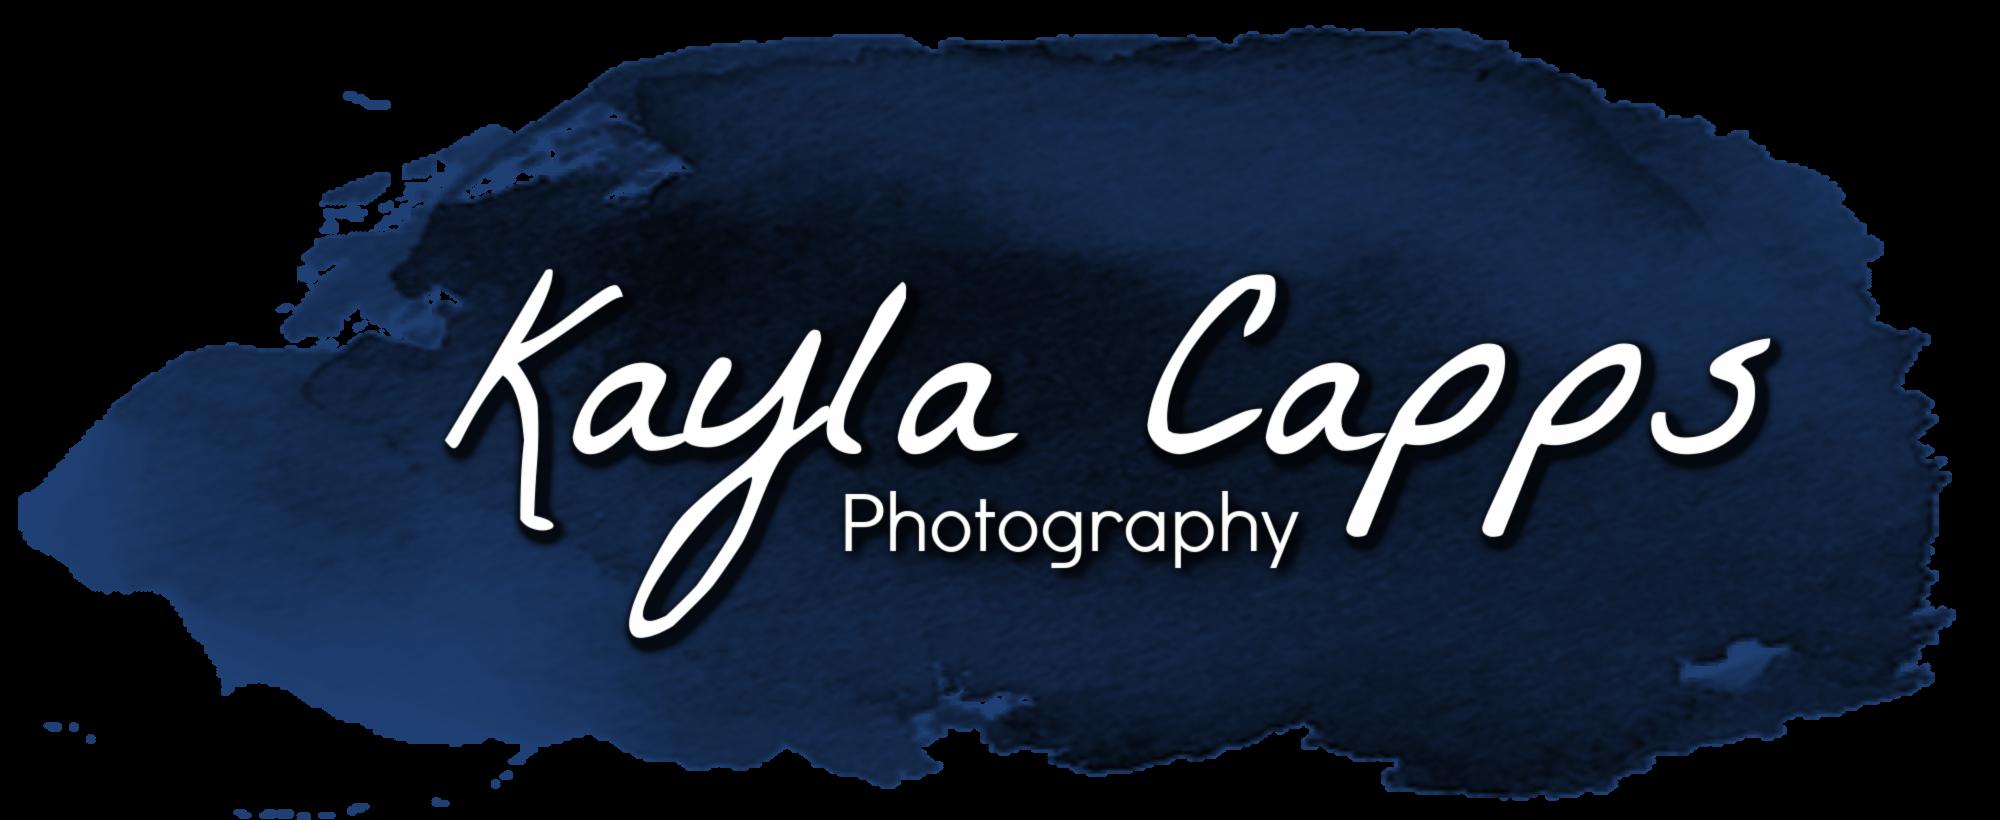 Kayla Capps Photography